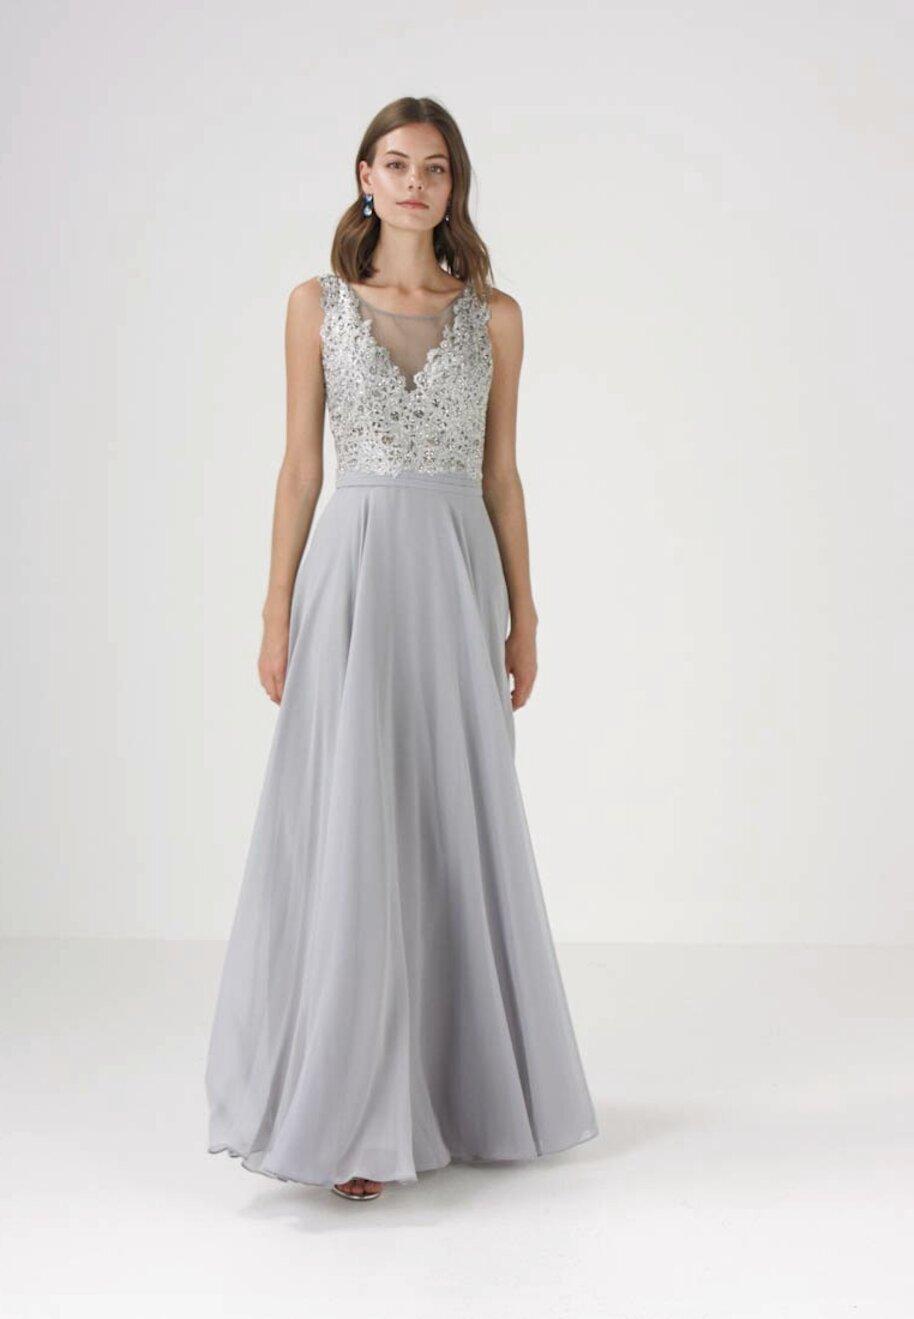 Hochzeitskleid, weiß, GR 18, LUXUAR LIMITED